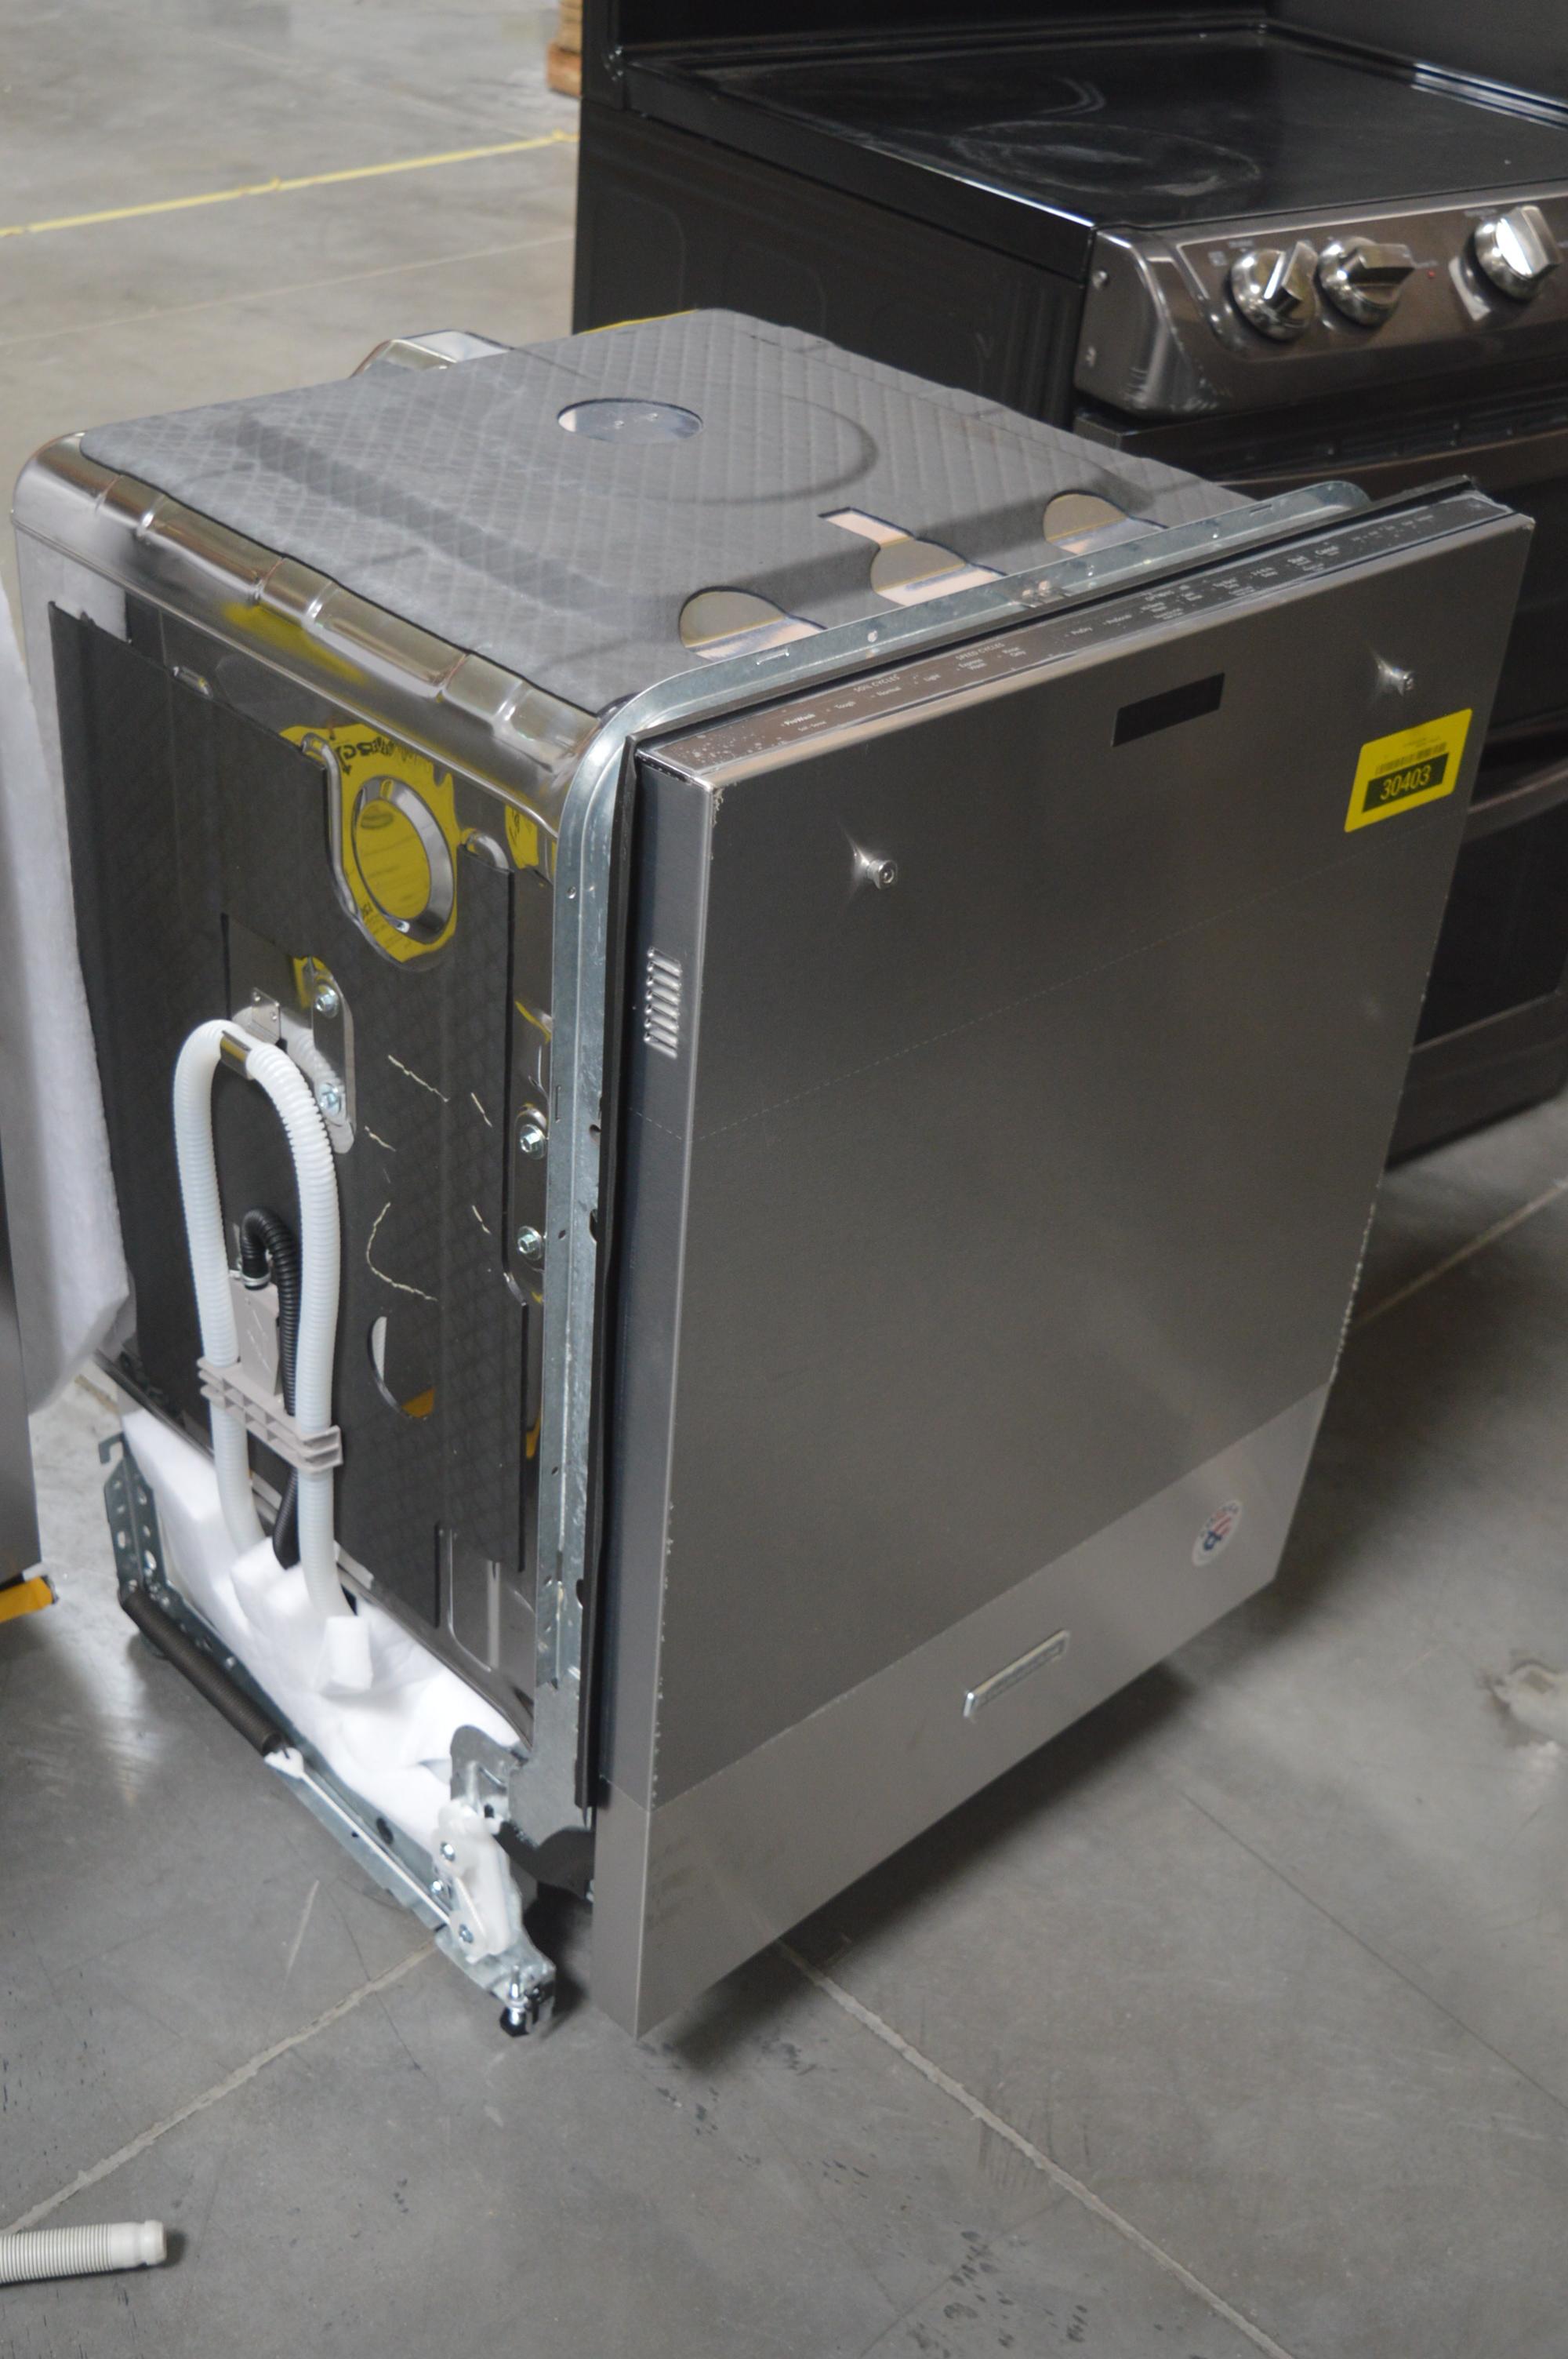 KitchenAid KDTM354DSS Fully Integrated Dishwasher Stainless